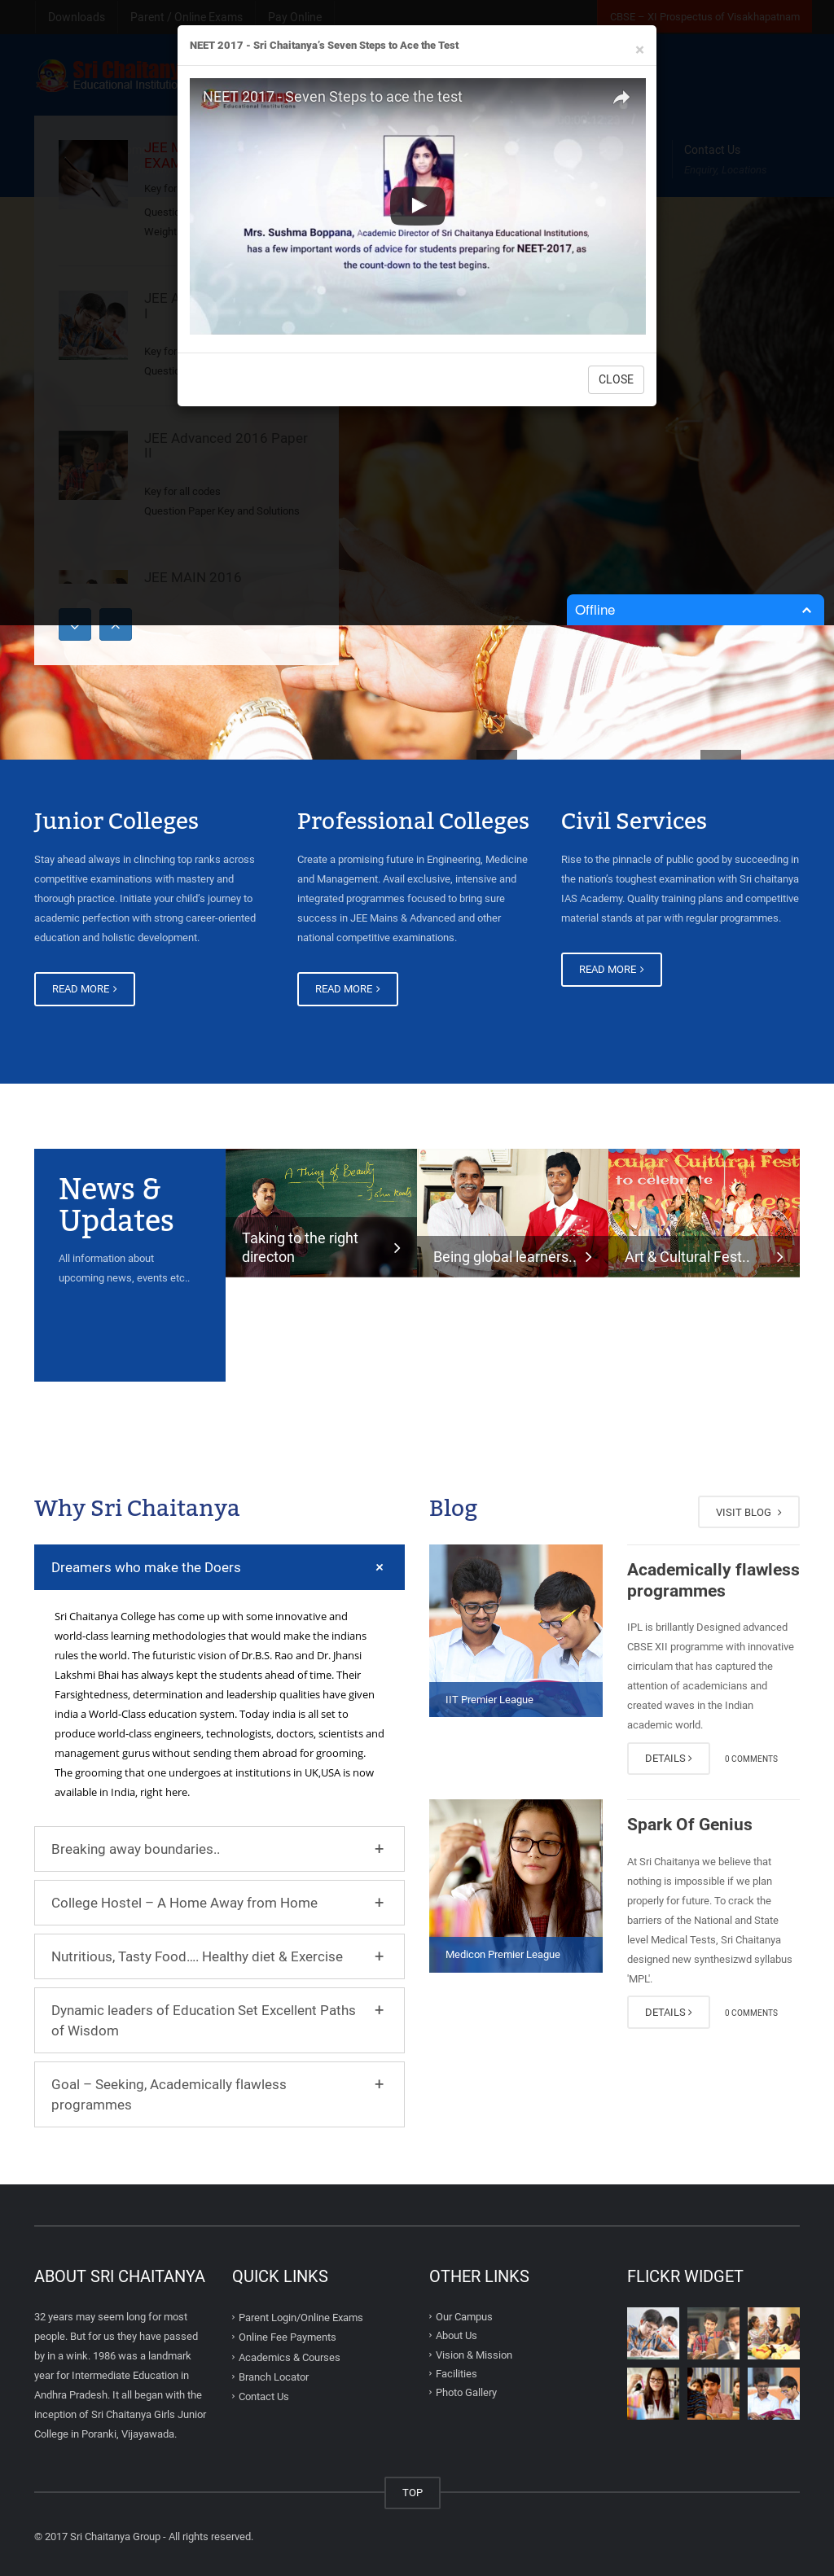 Sri Chaitanya Educational Institutions Competitors, Revenue